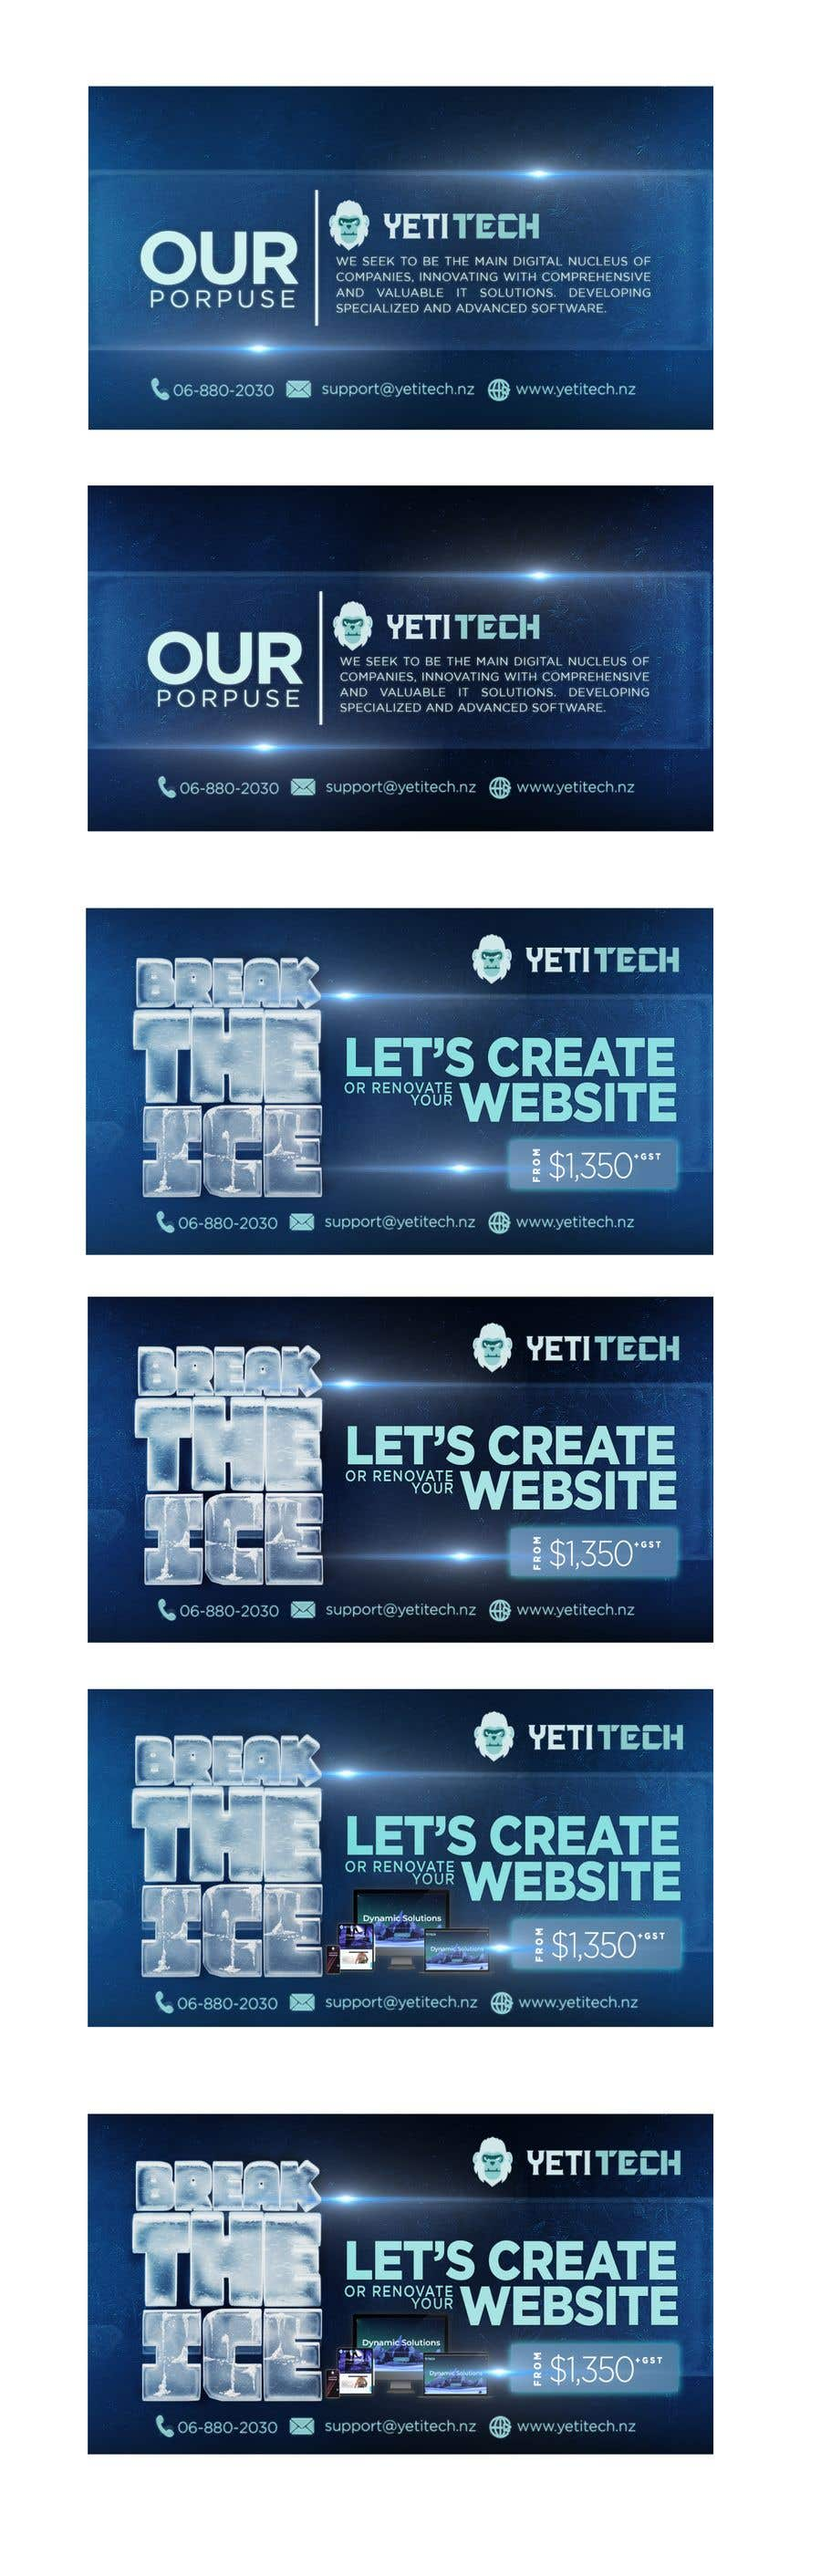 Konkurrenceindlæg #                                        40                                      for                                         EASY WORK: Design Marketing Post cards for Web Development company - 07/04/2021 22:29 EDT